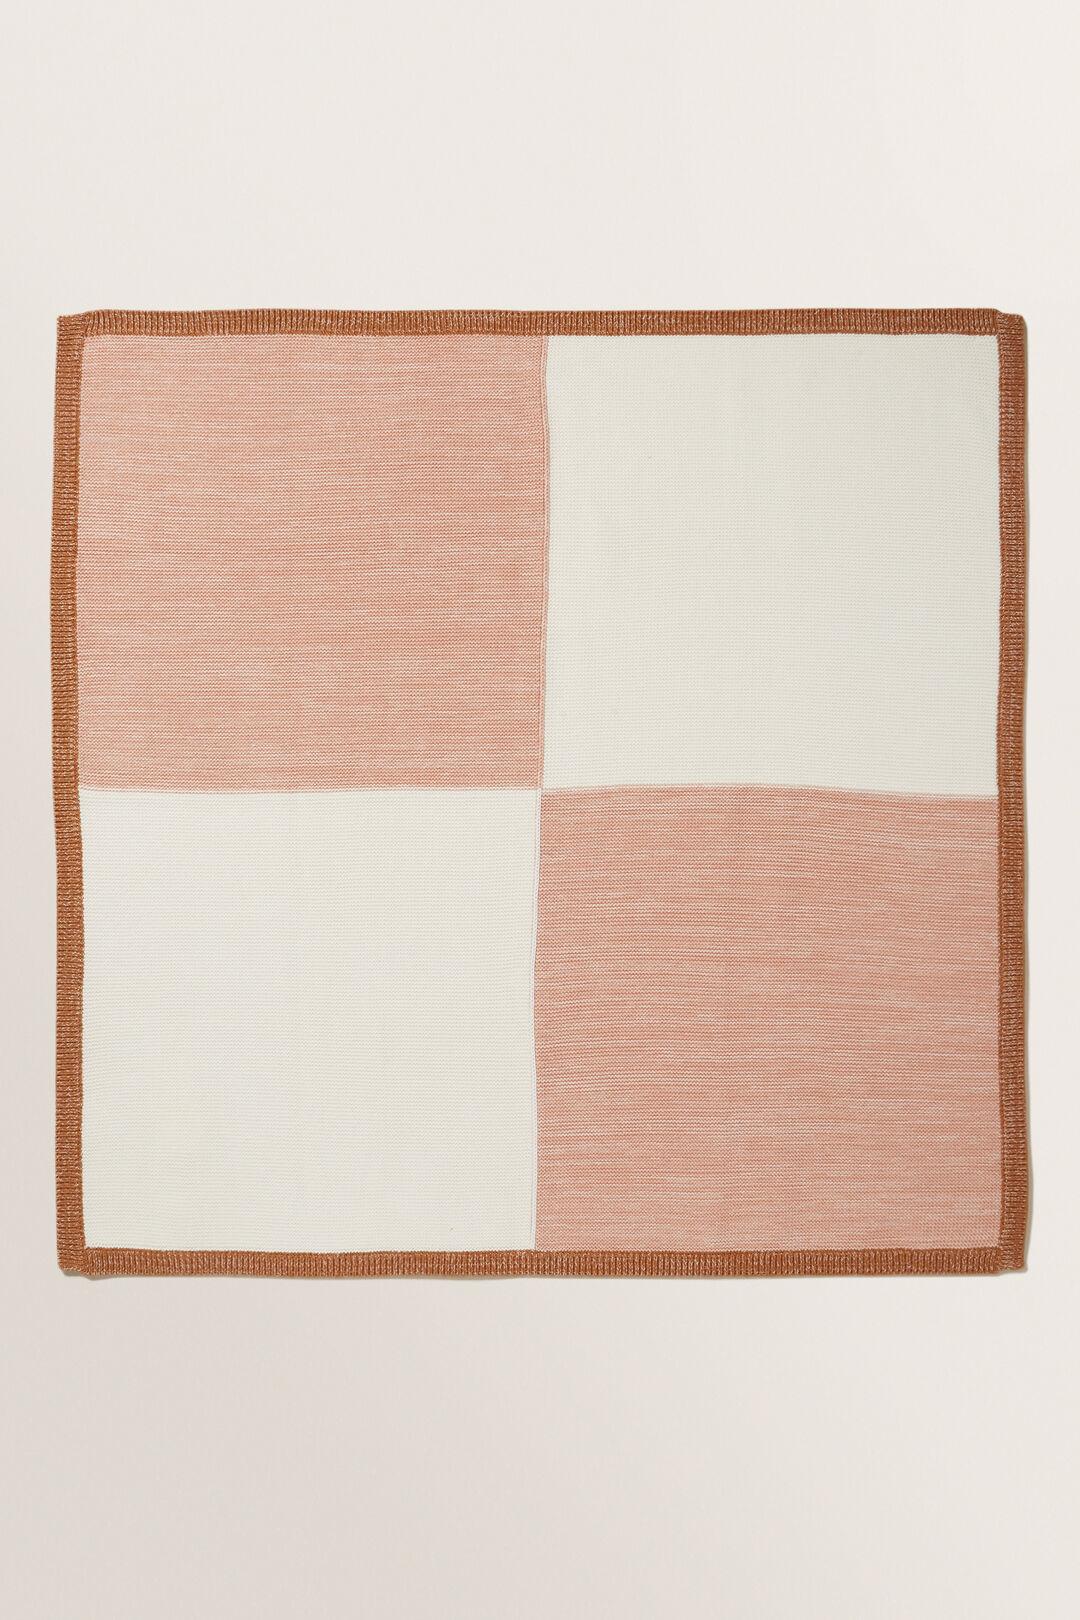 Colour Block Blanket  PINK CLAY  hi-res